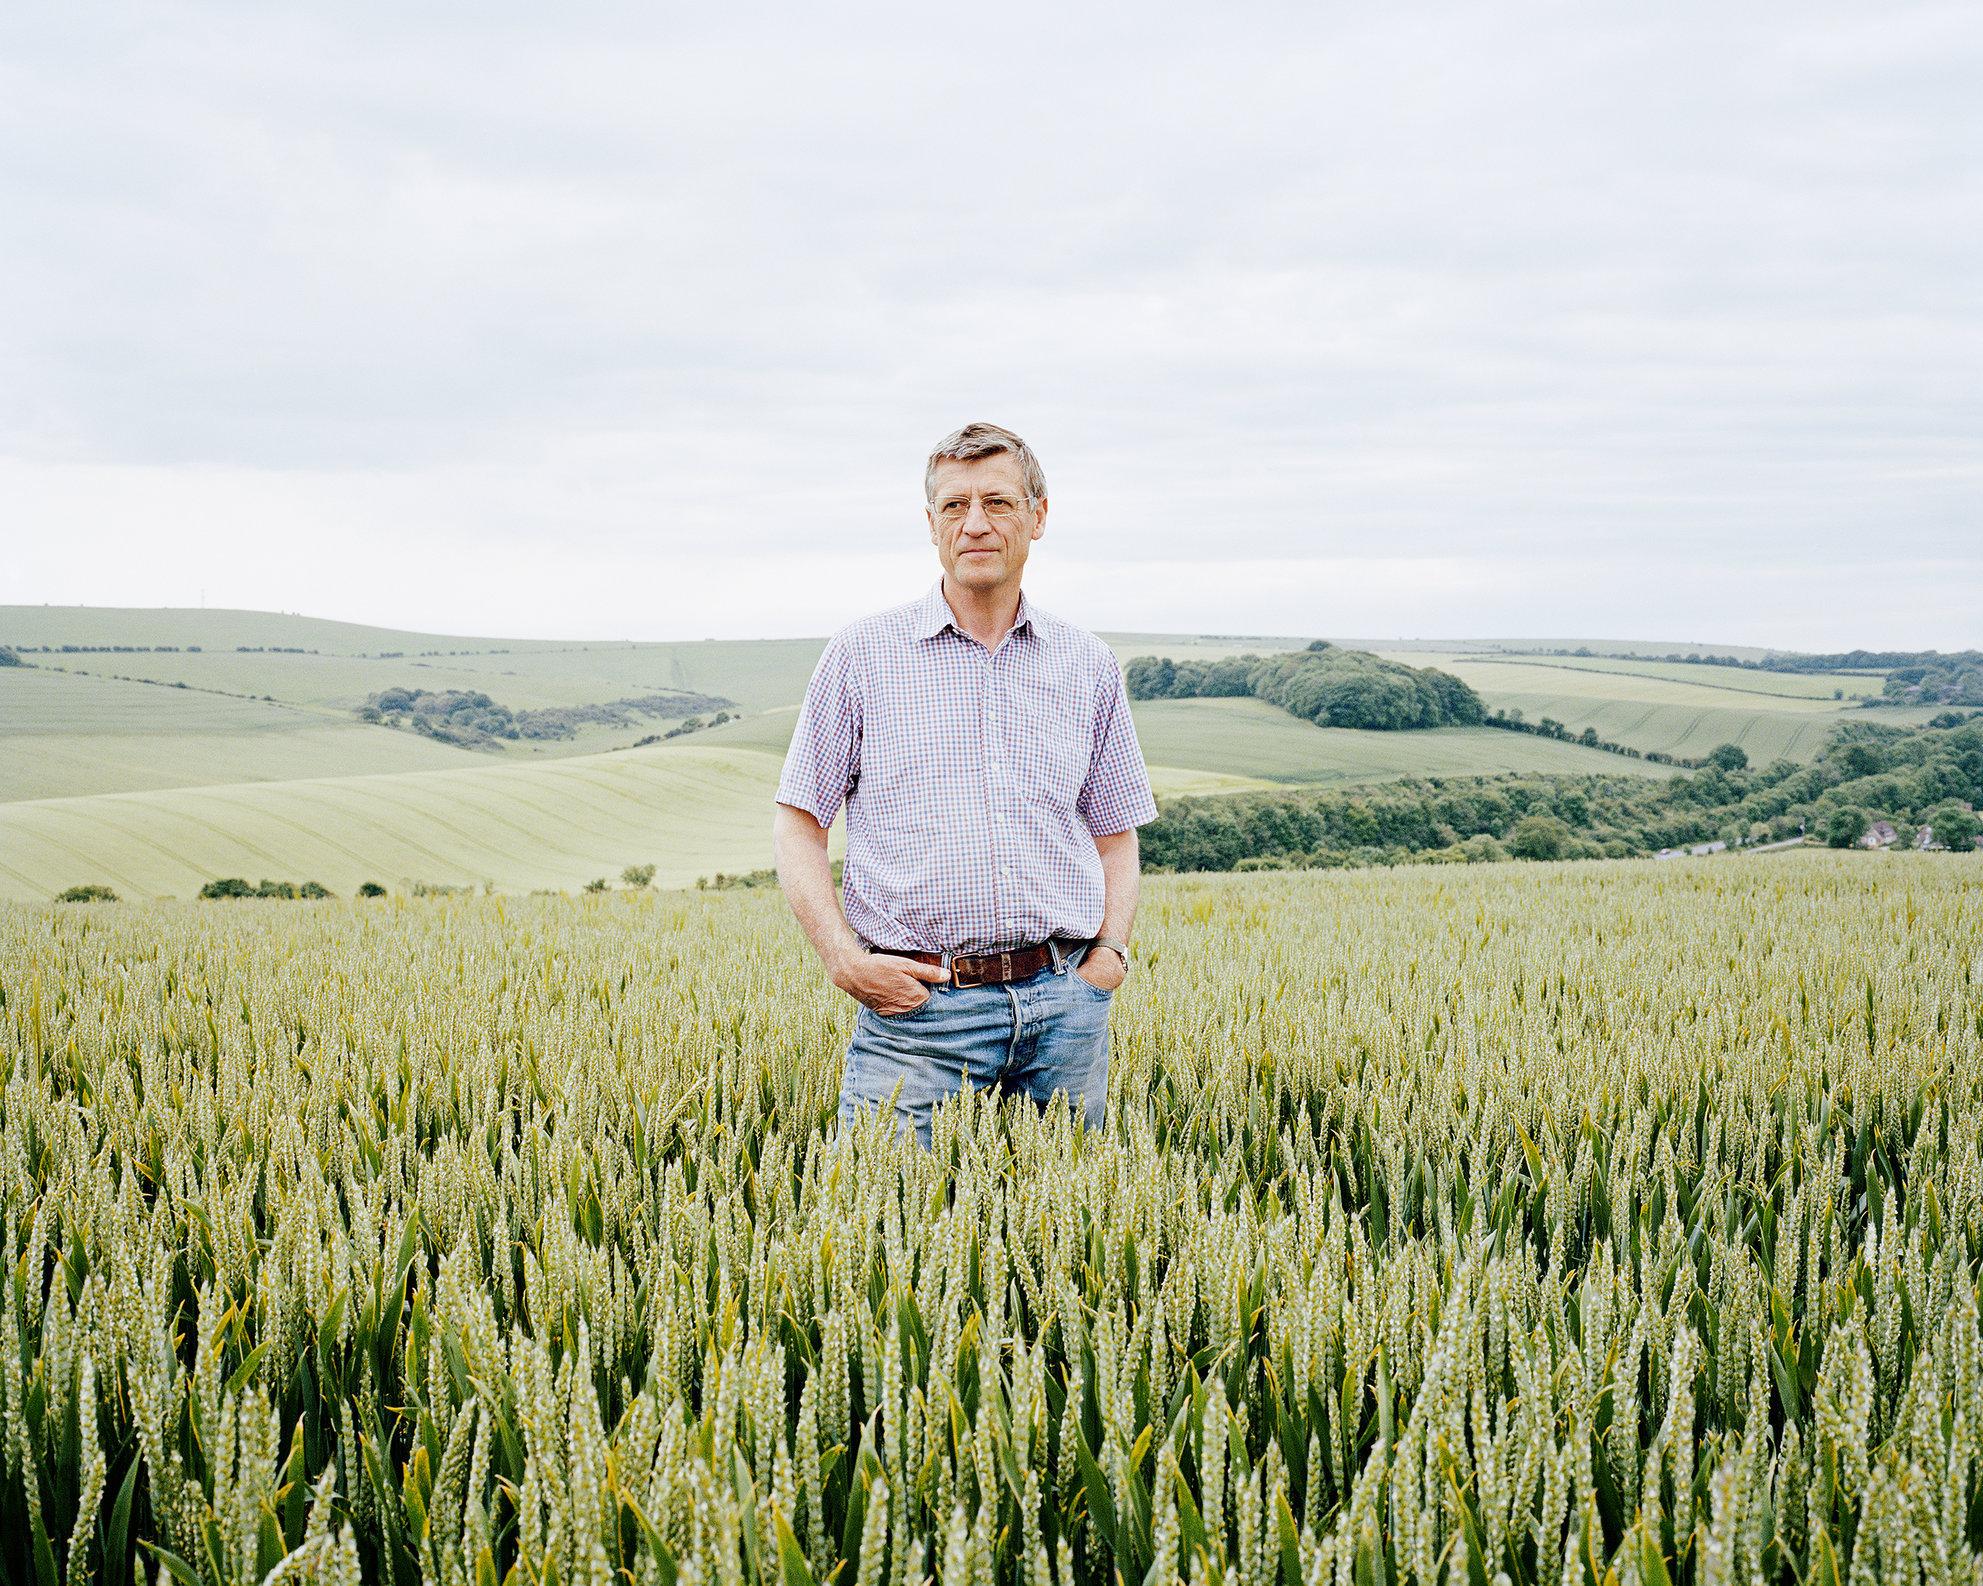 David Taylor, Housedean Farm